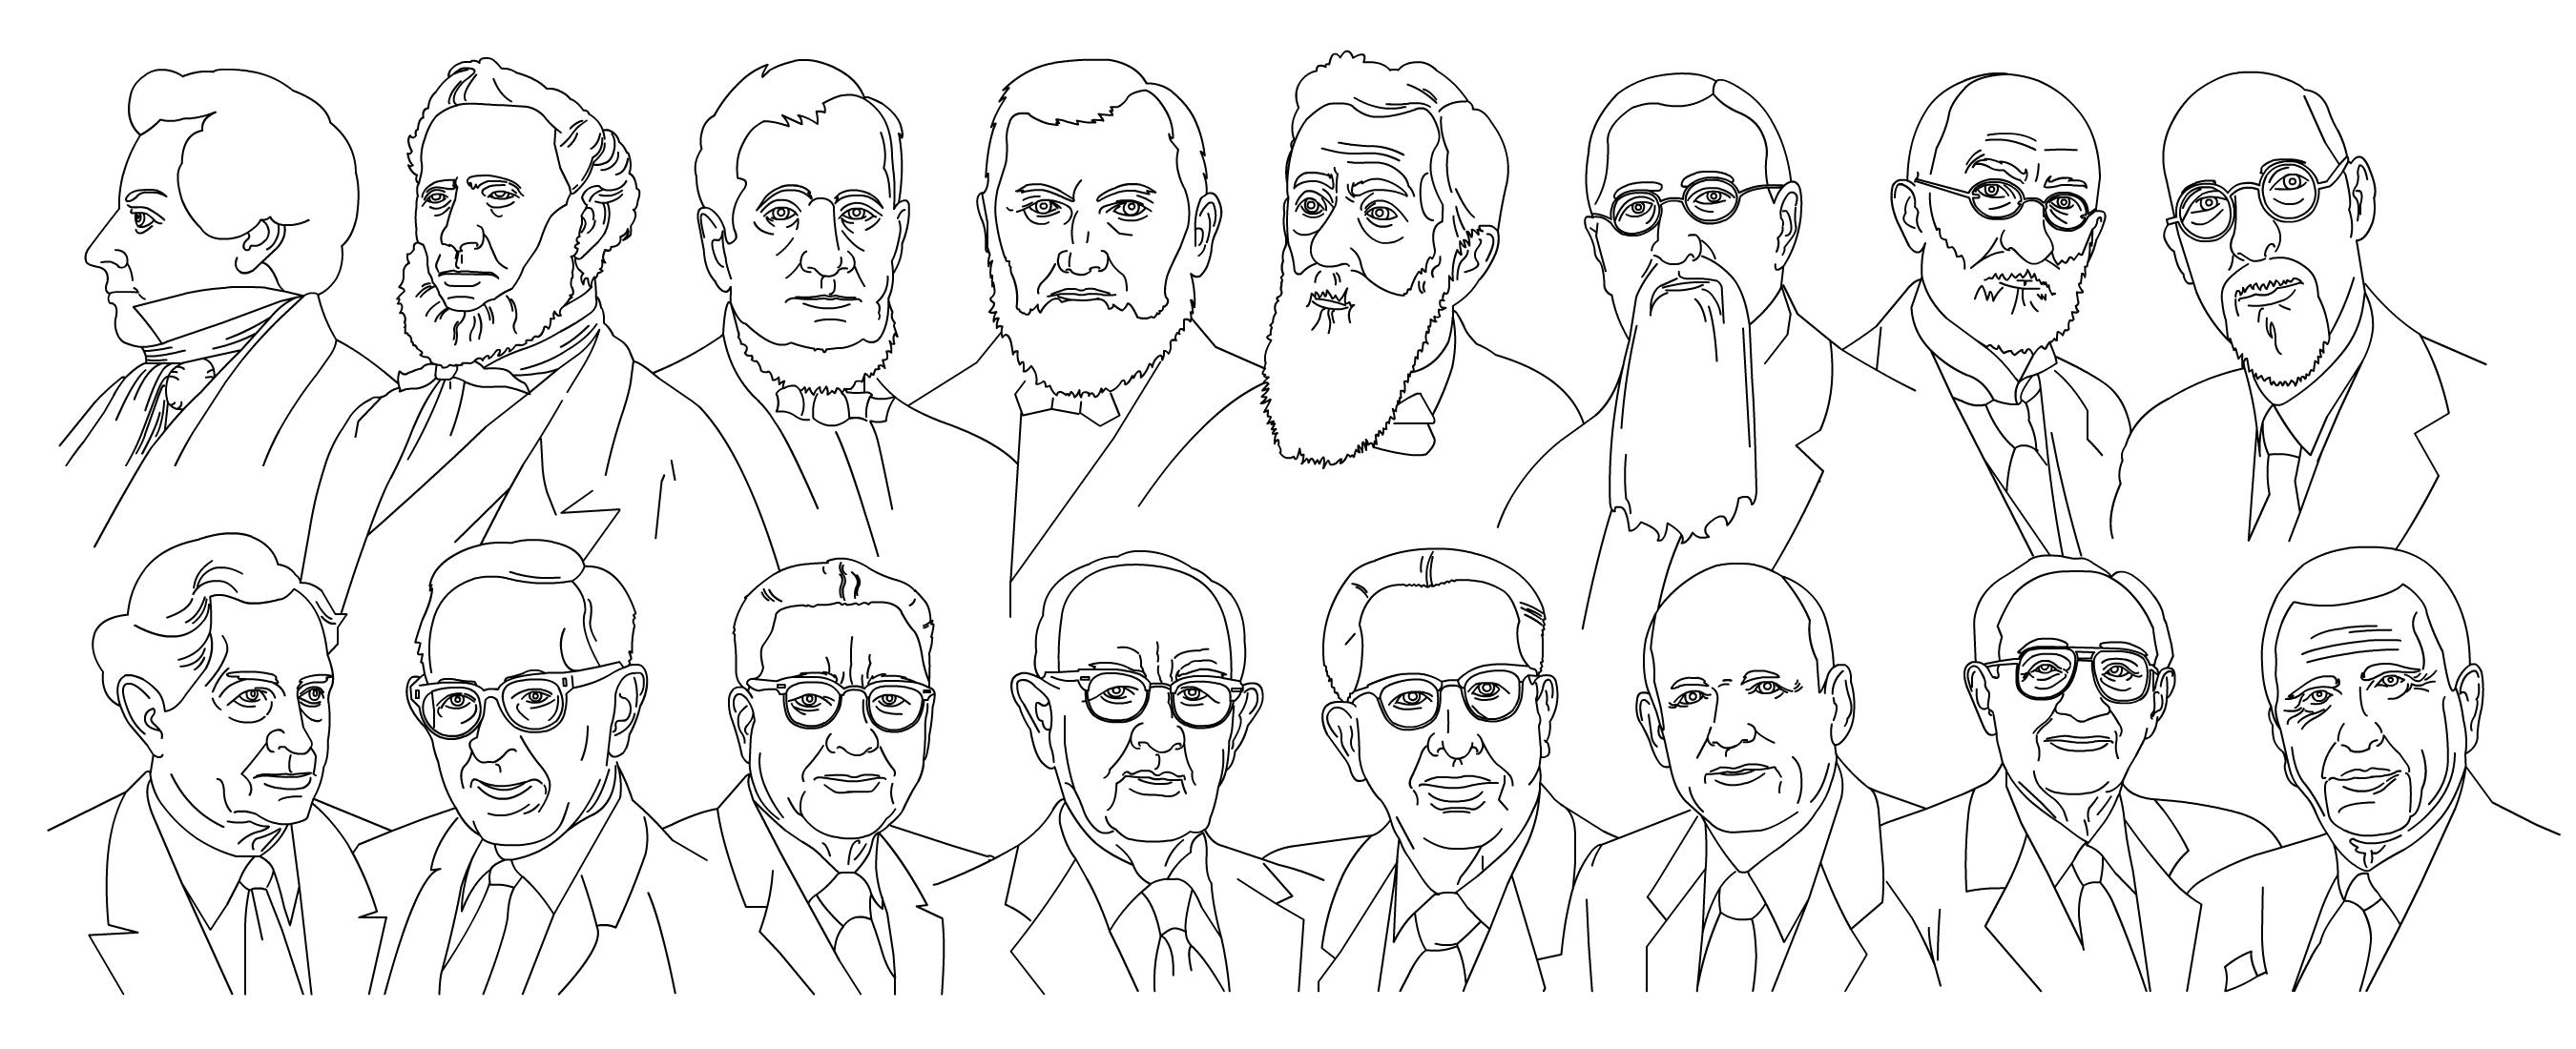 book of mormon prophets clipart #6